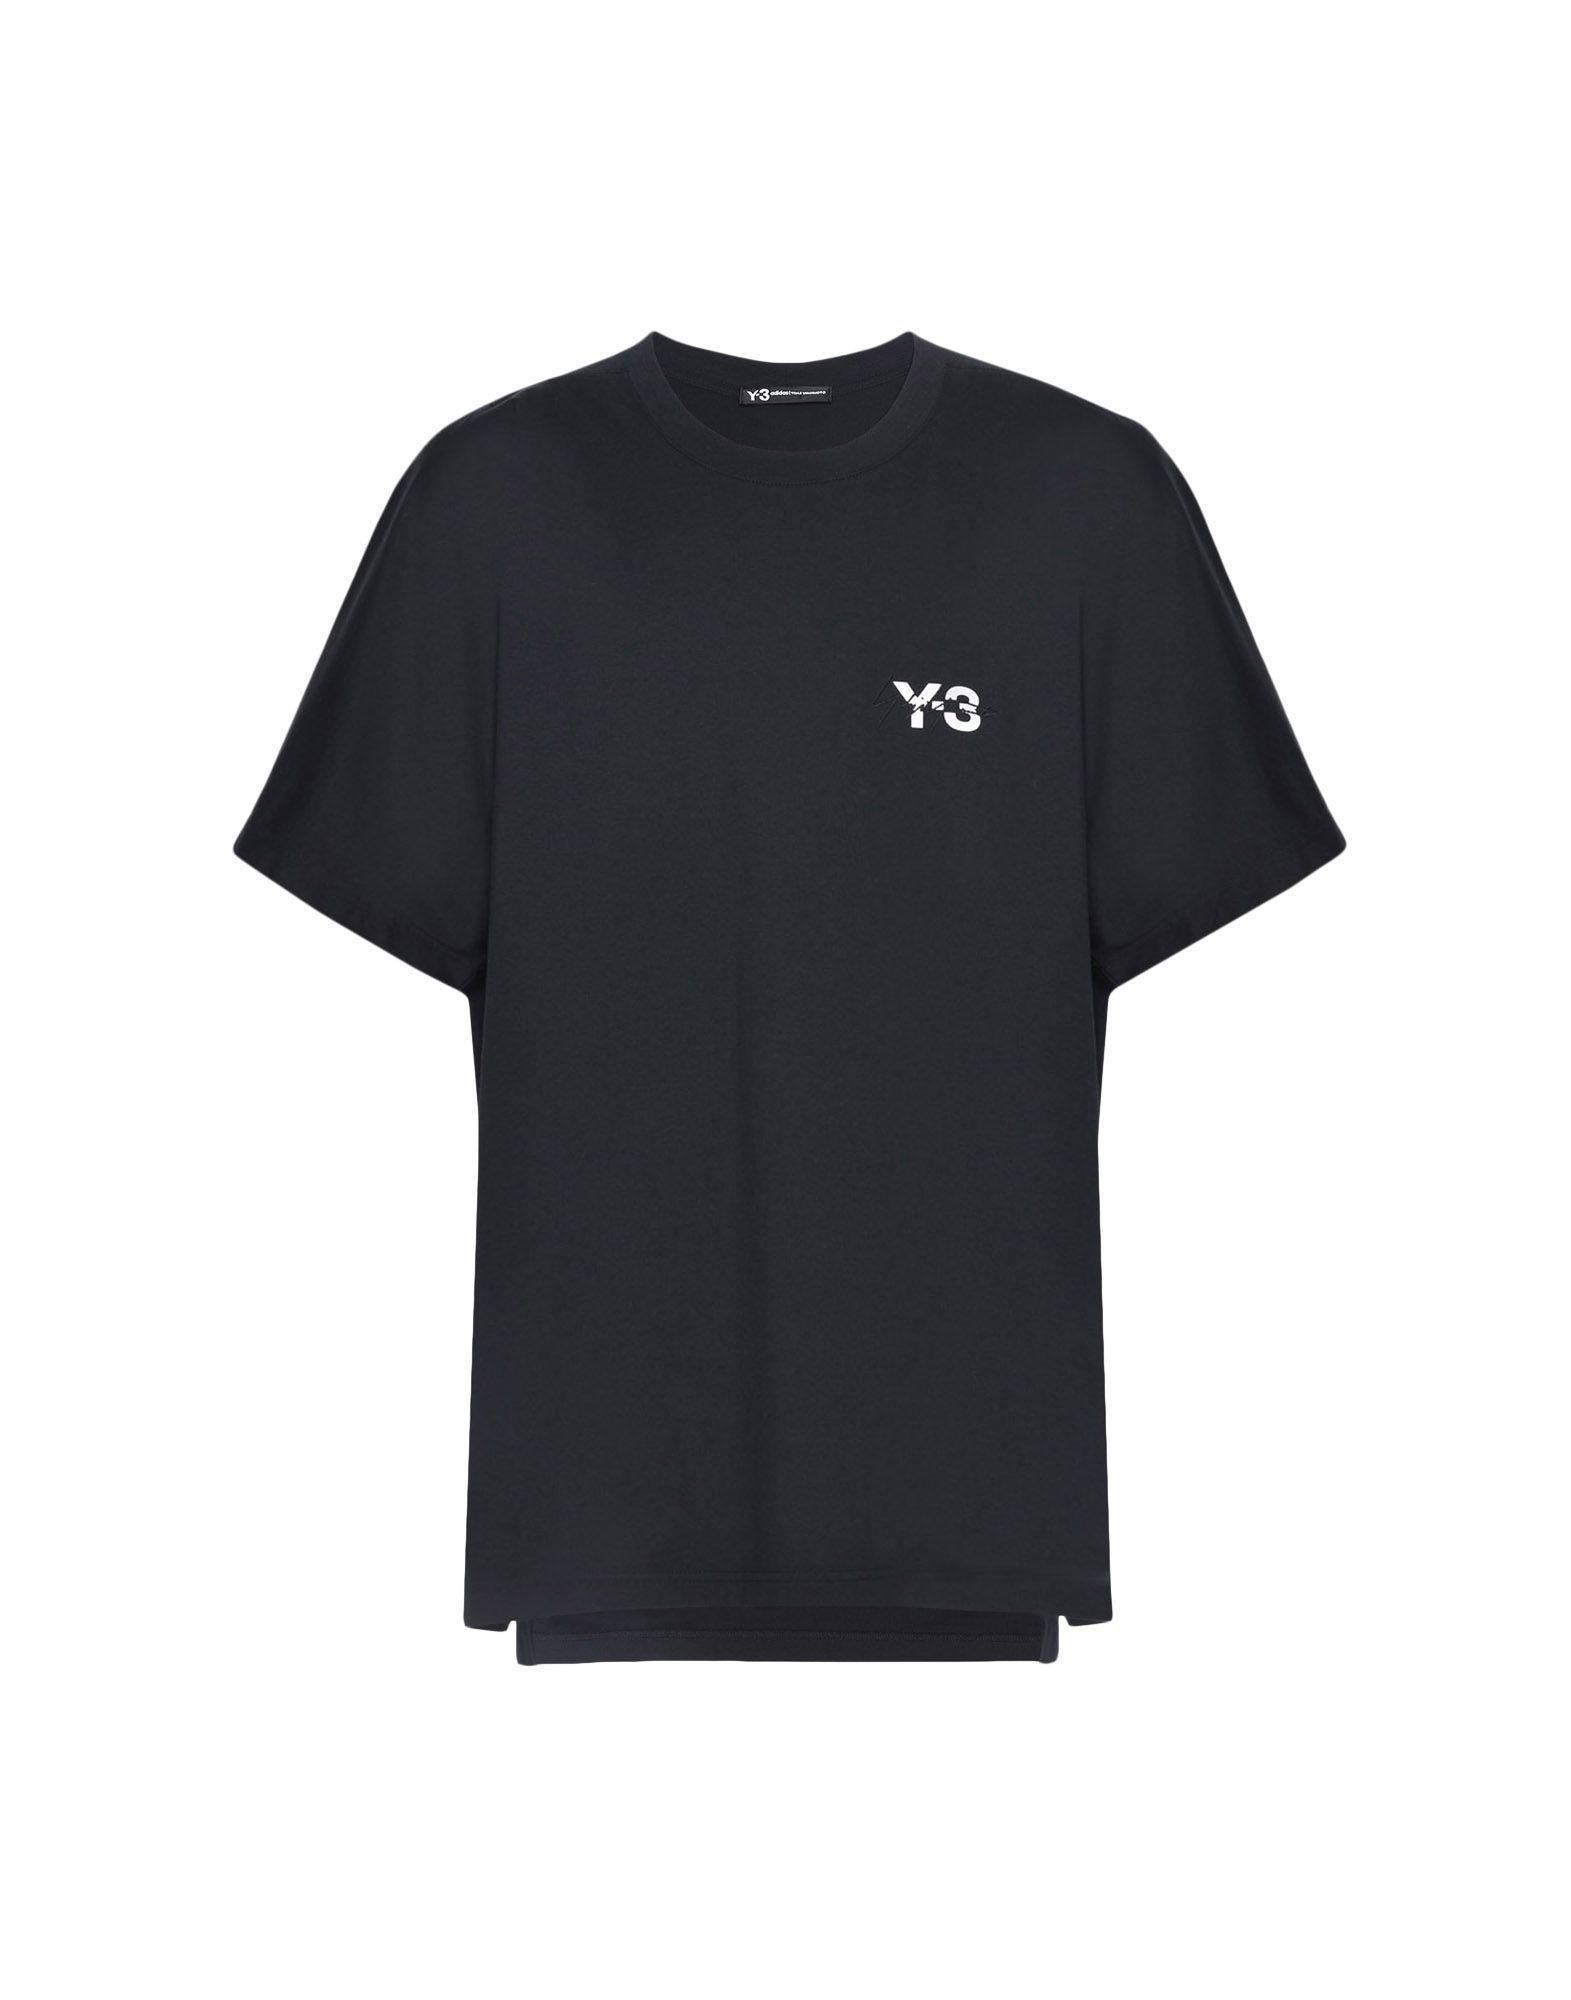 Y-3 SIGNATURE TEE